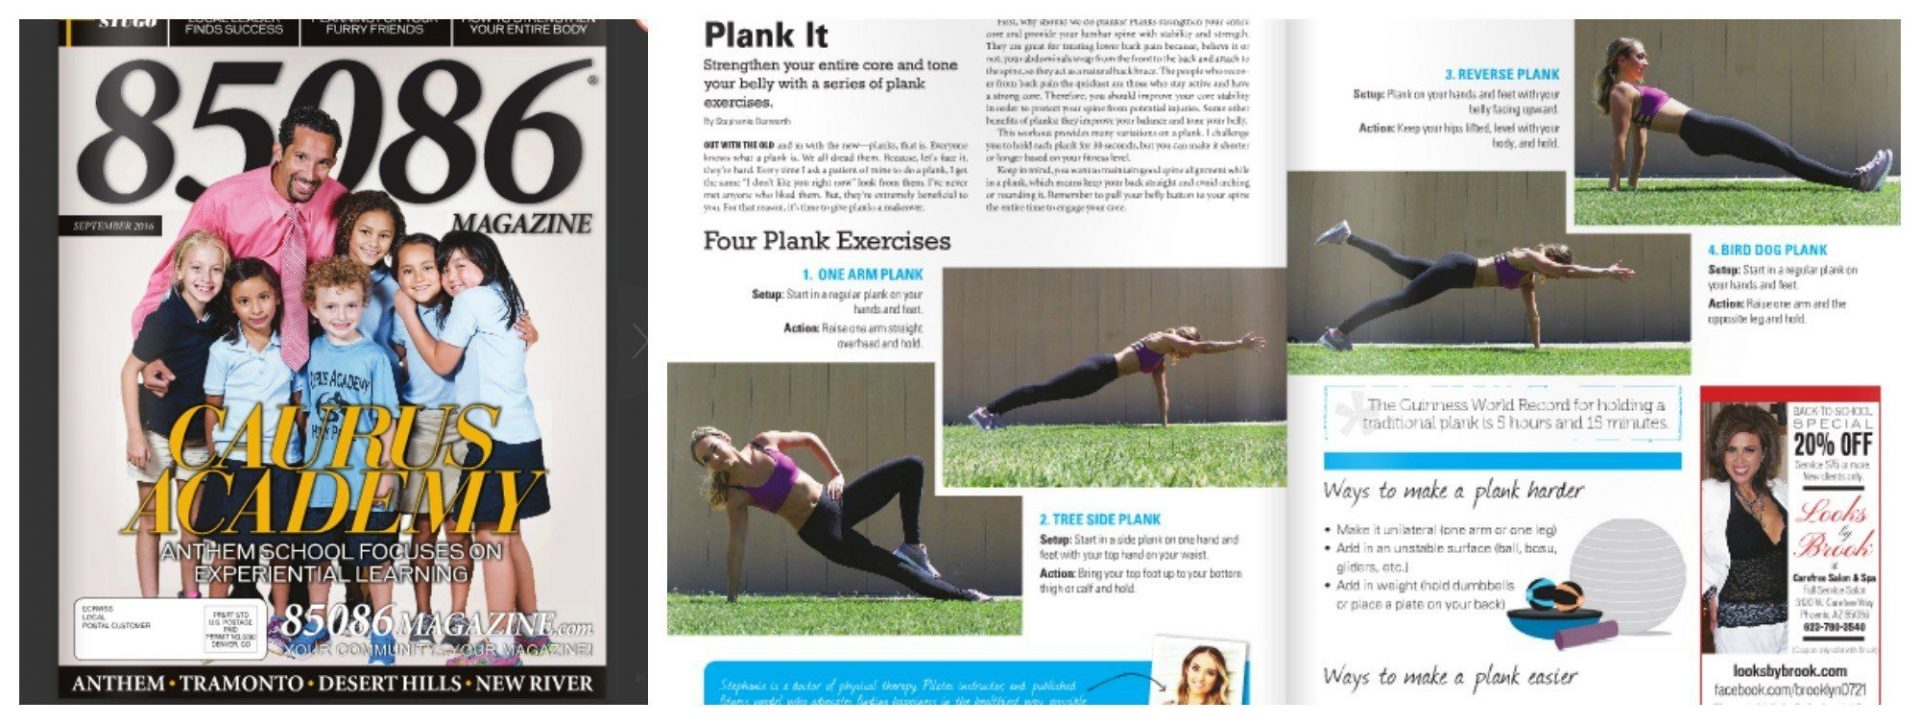 85086 magazine planks